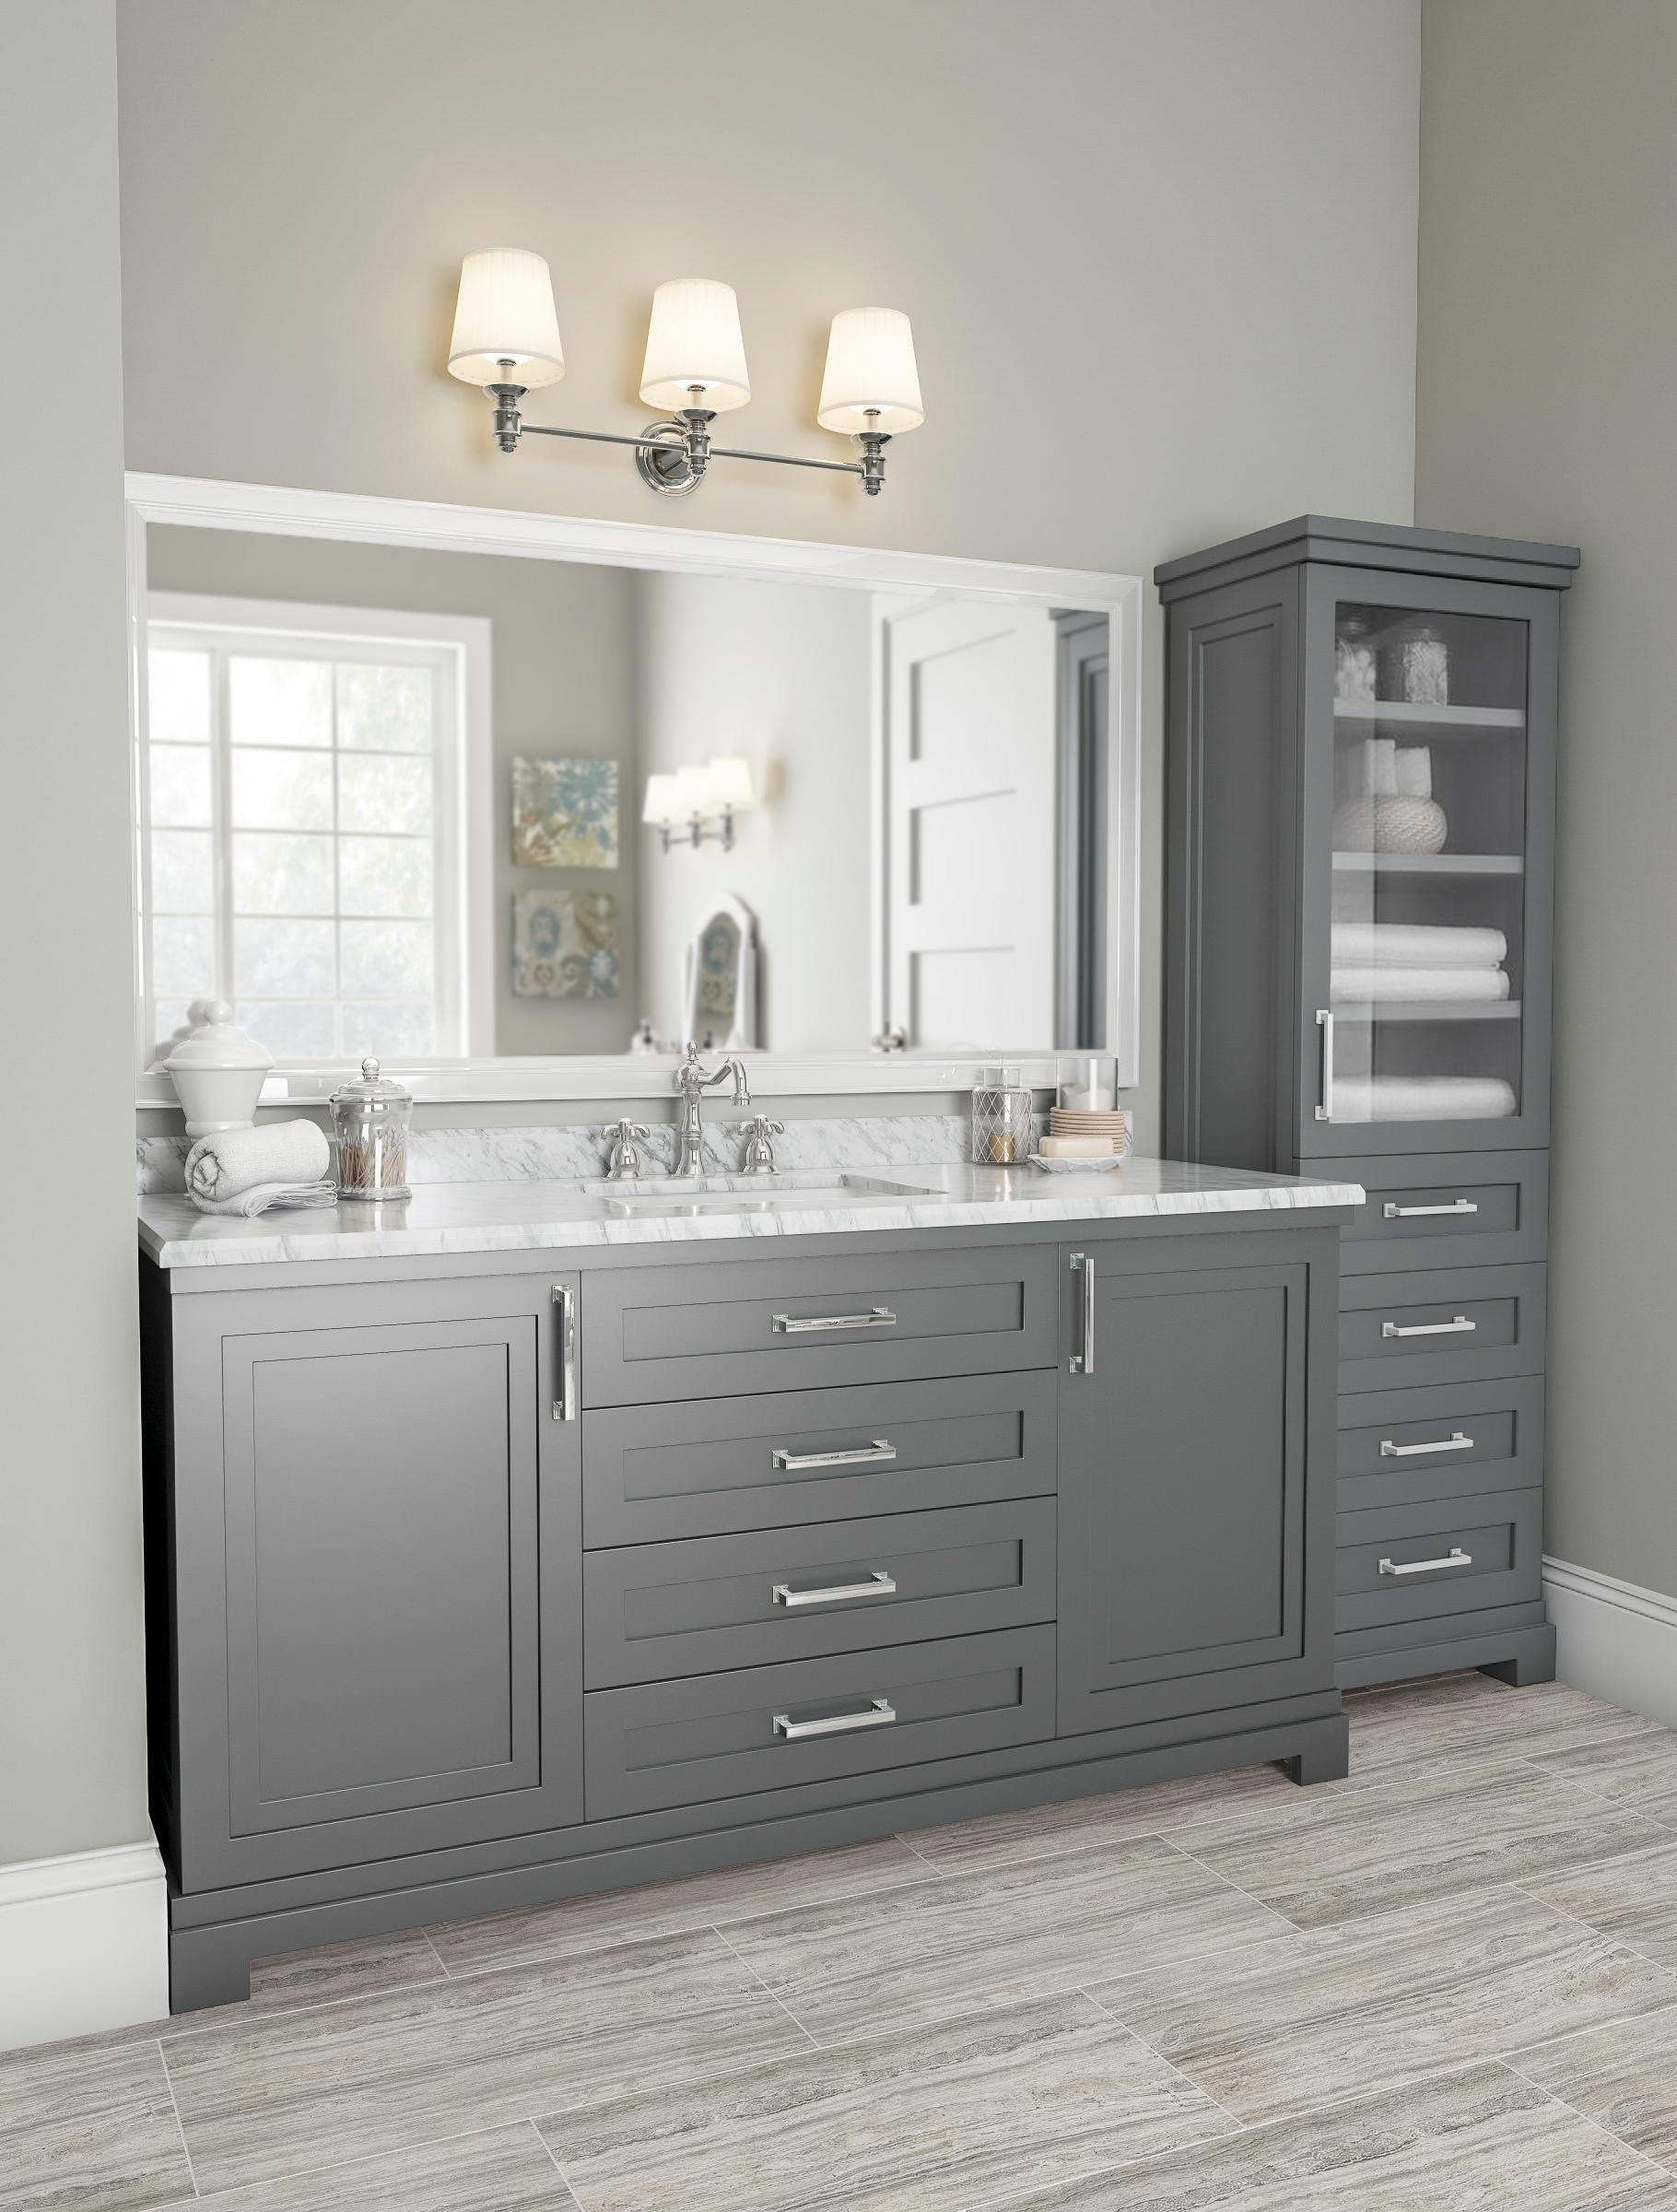 Classic Gray Bathroom Bathroom Vanity Decor Farmhouse Bathroom Vanity Bathroom Remodel Master